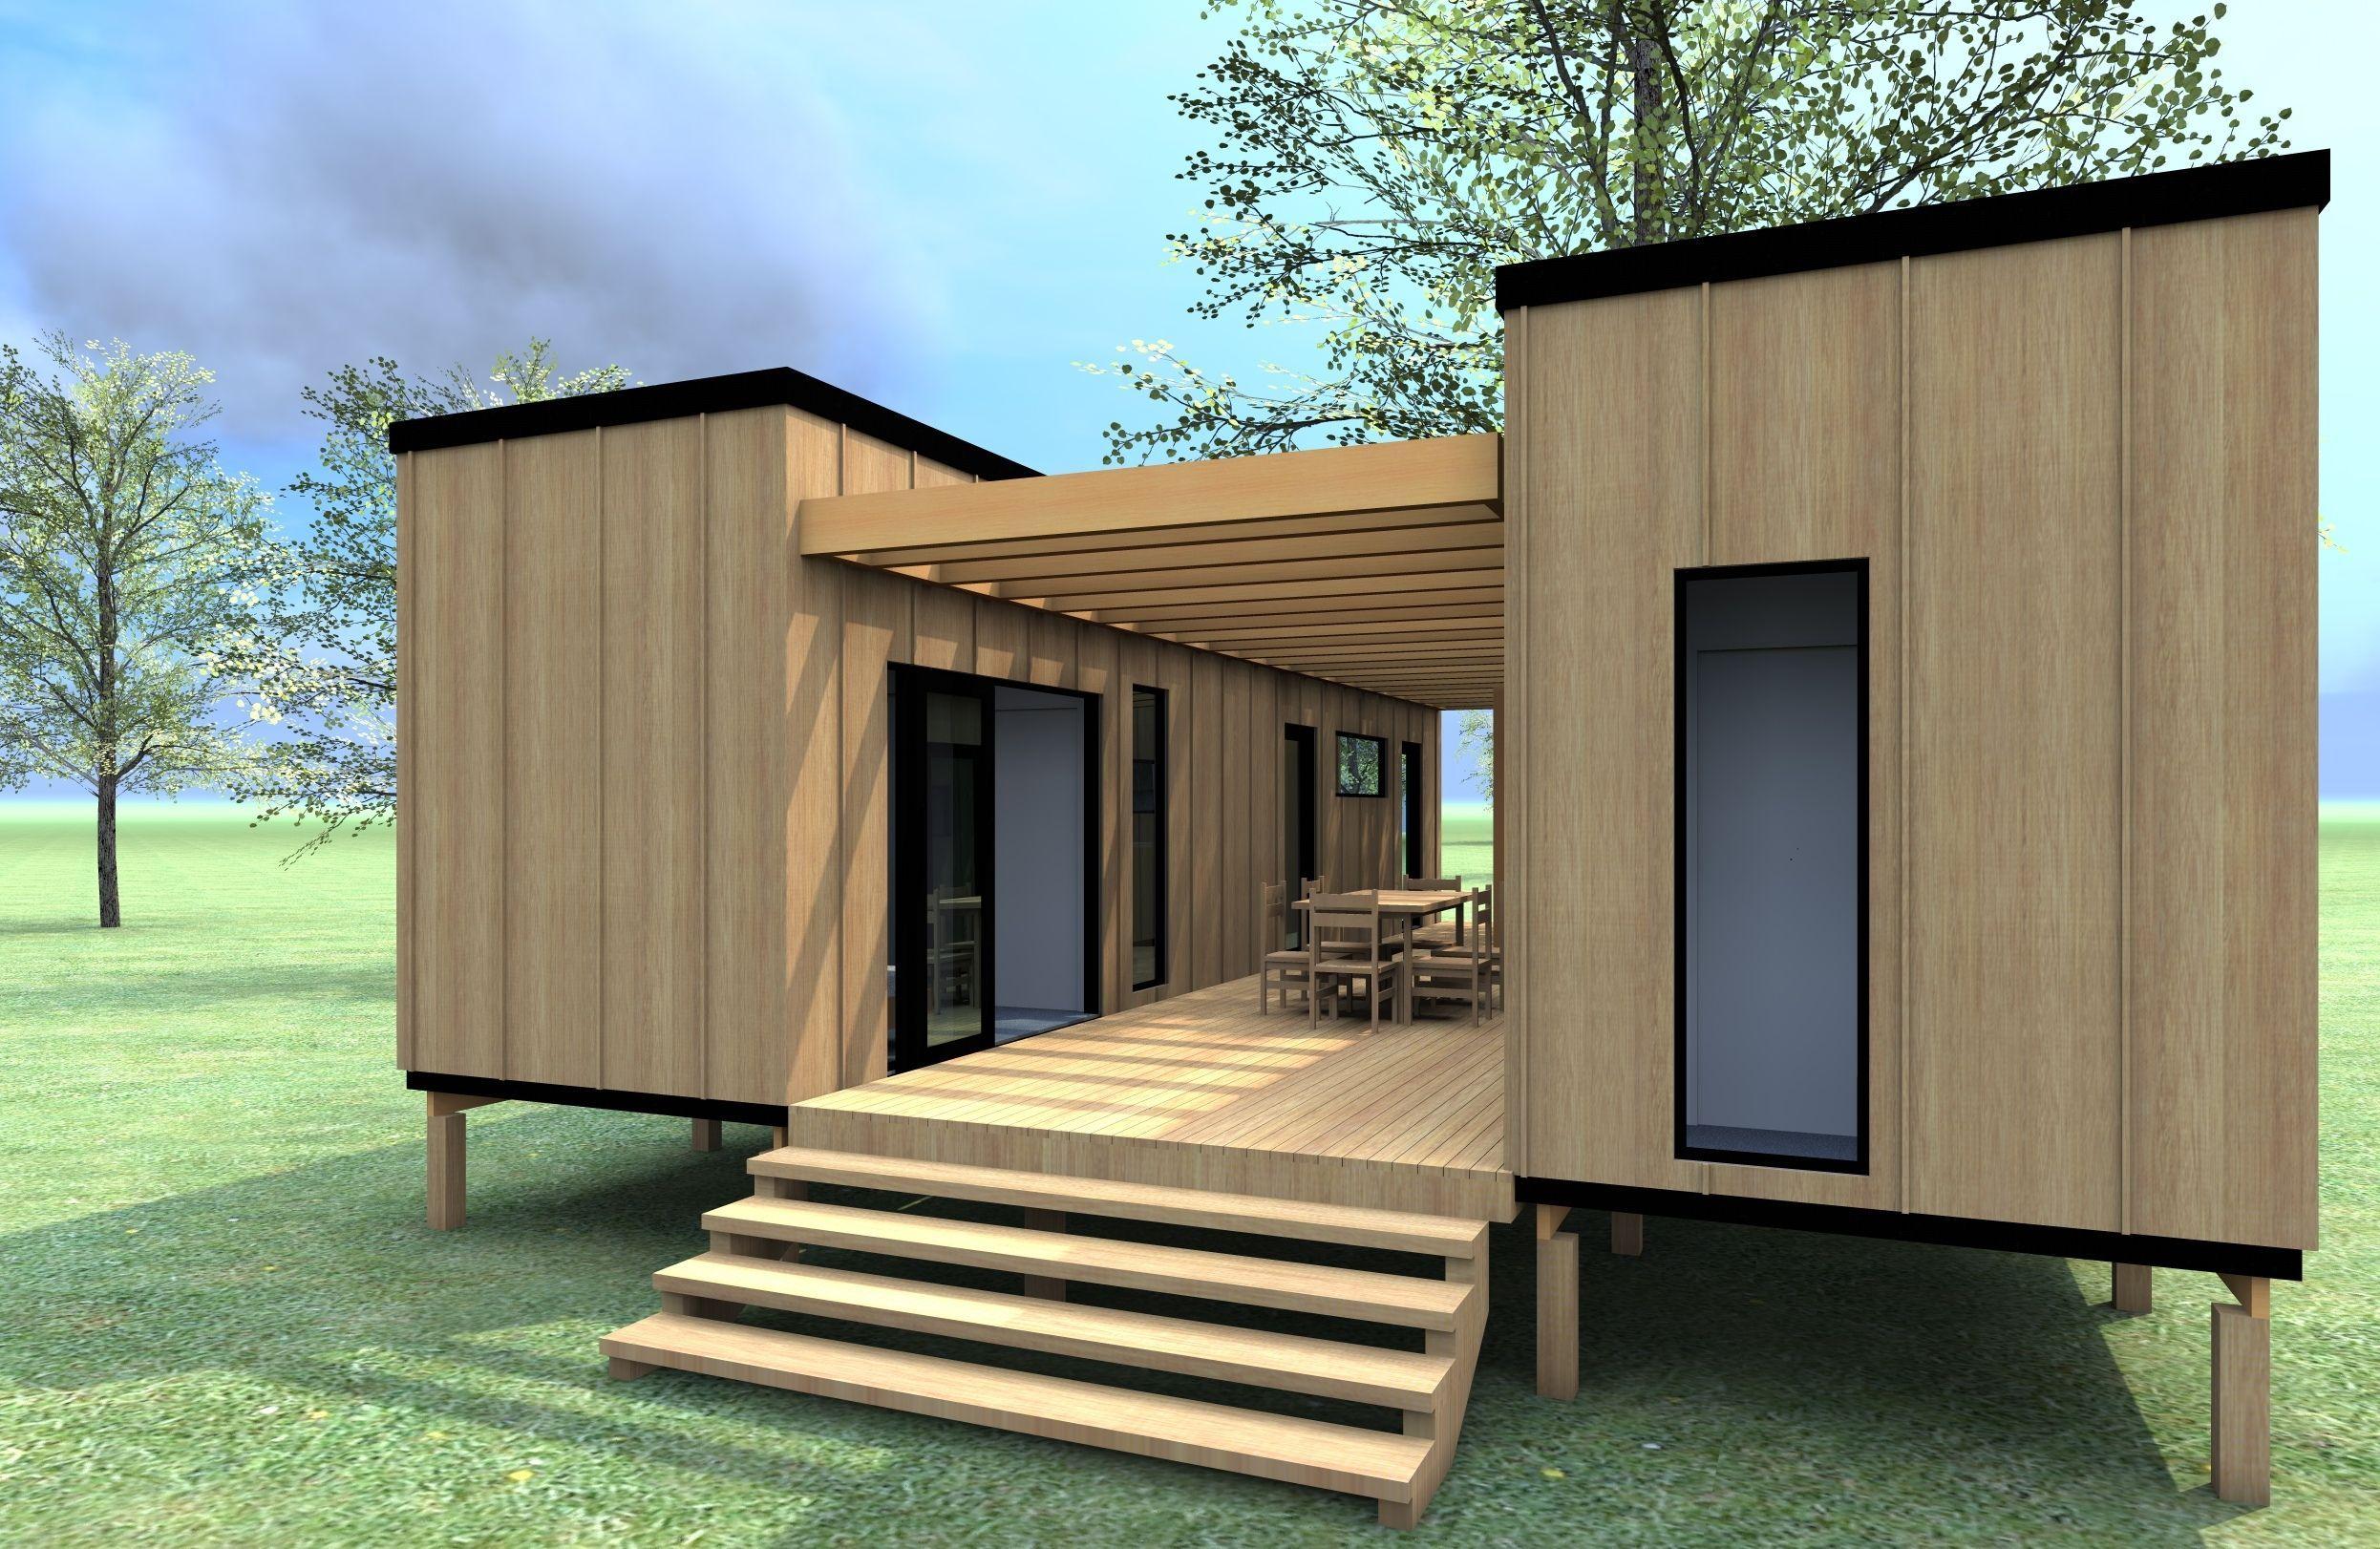 Farmhouse Home Decor Ideas at Target | Sengerson